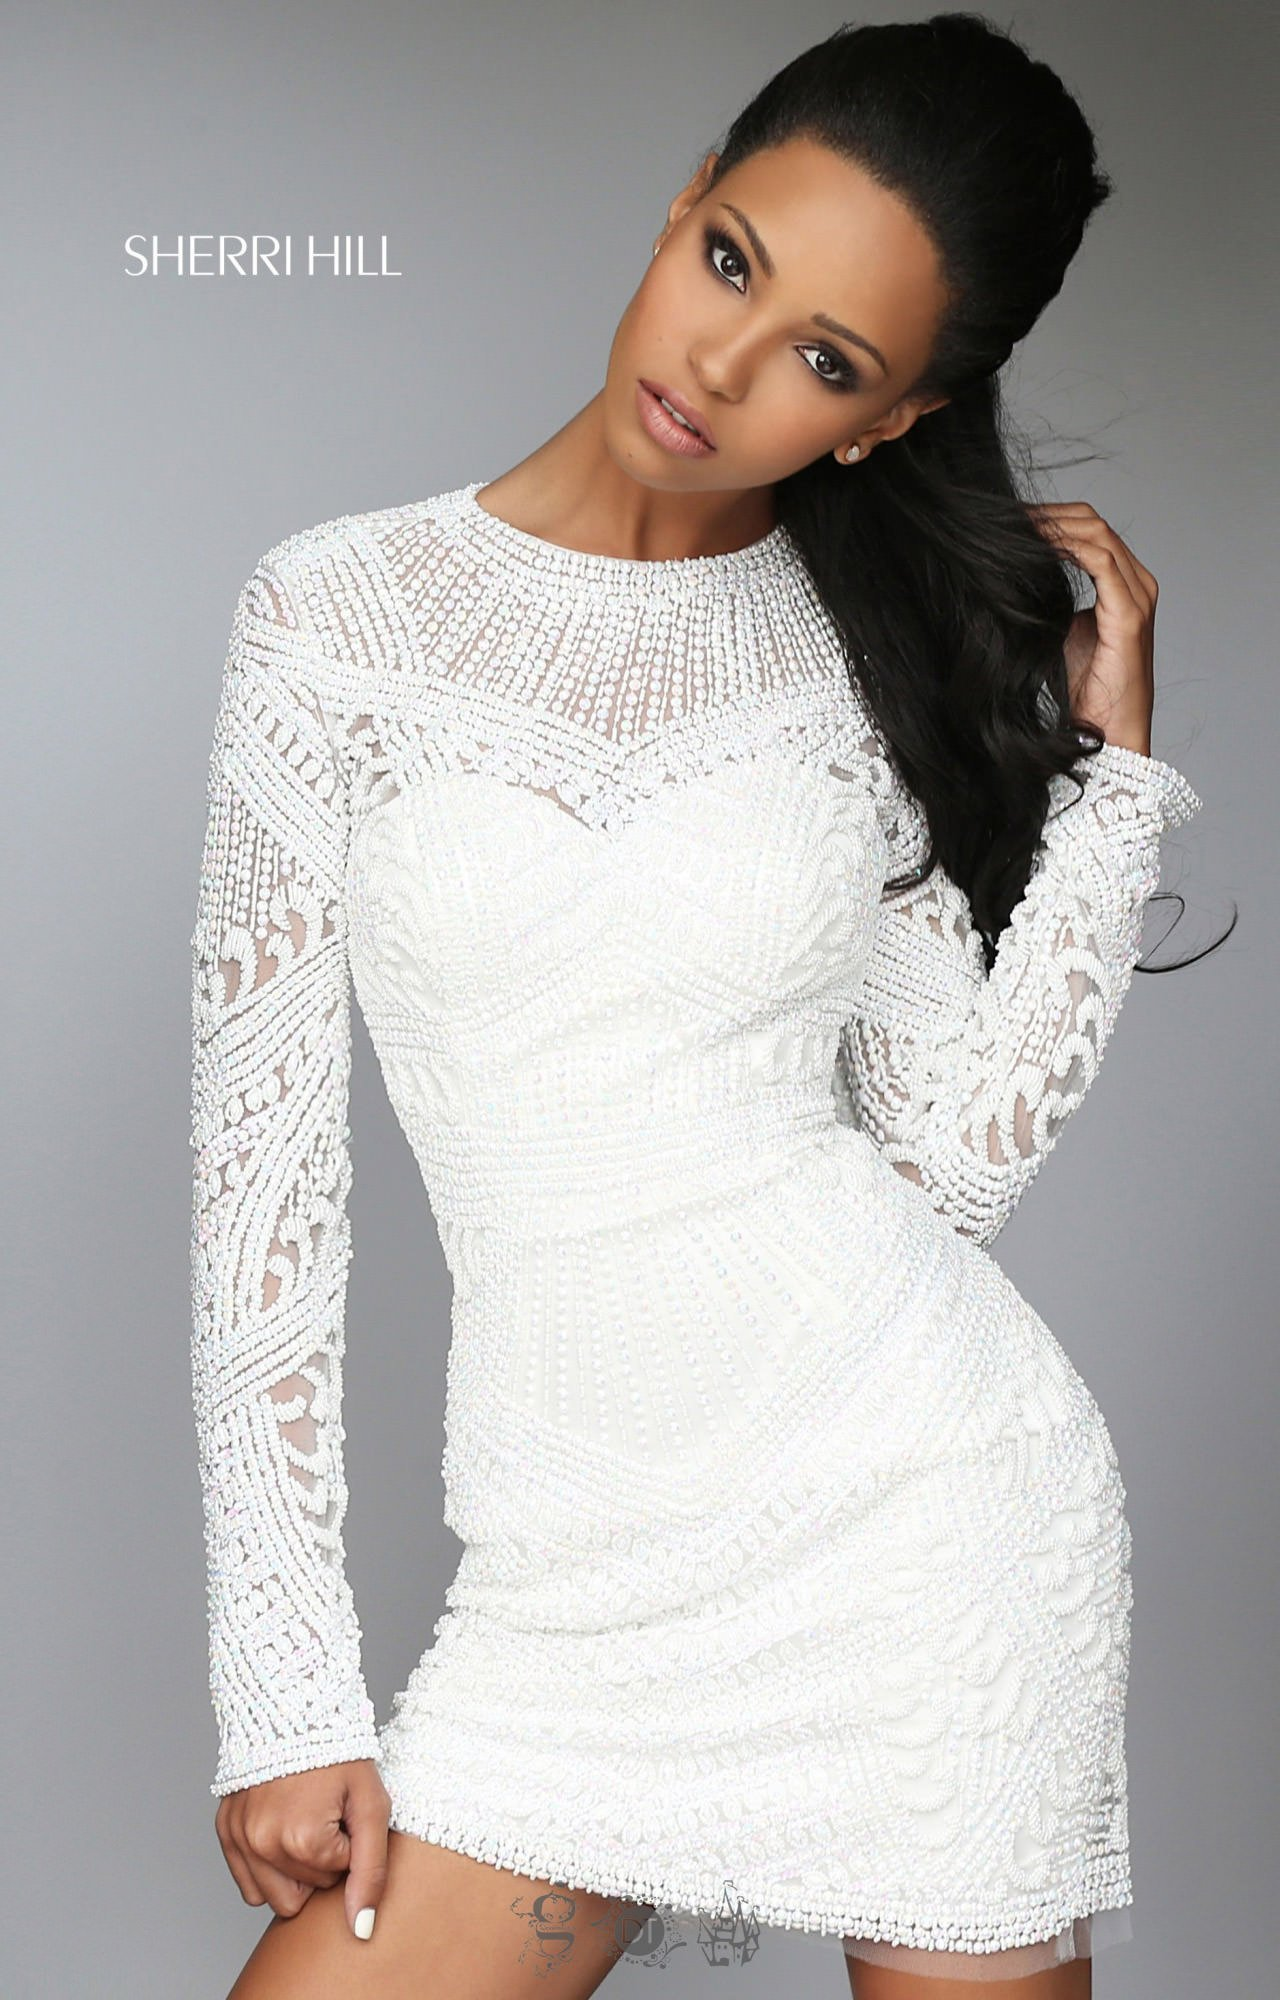 de6a40eb4e8 Sherri Hill 50518 - Short Fully Beaded Long Sleeve Dress with Open Back